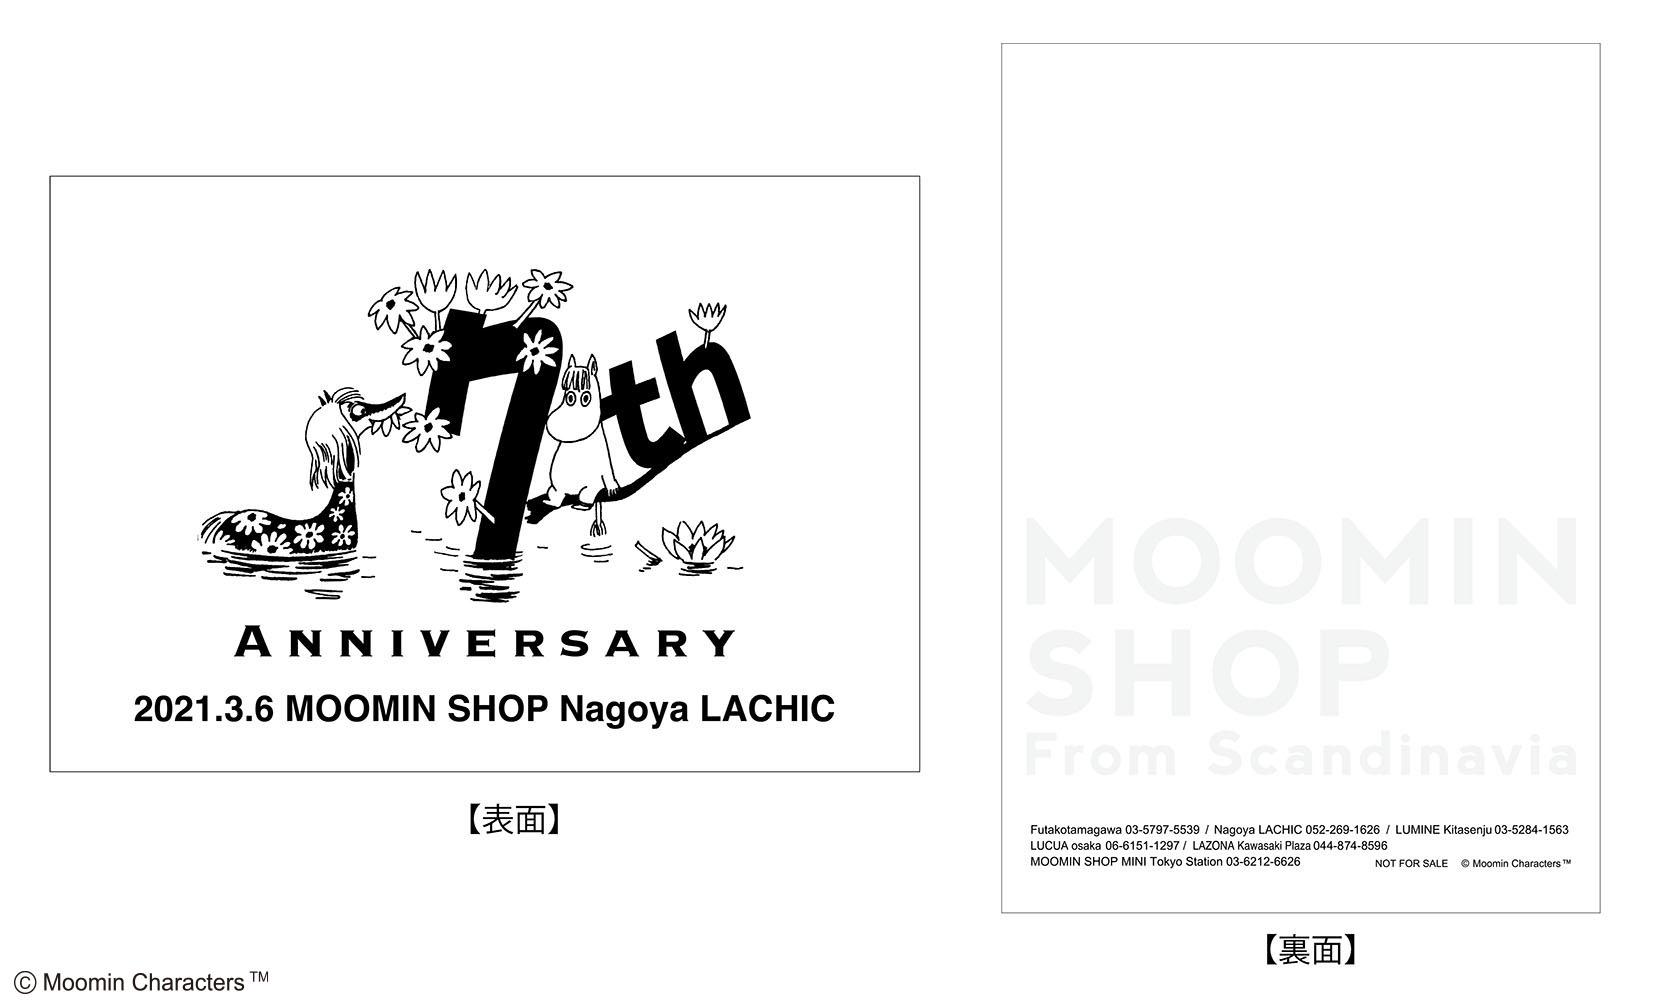 moomin_nagoya_7th_card_cs5-2